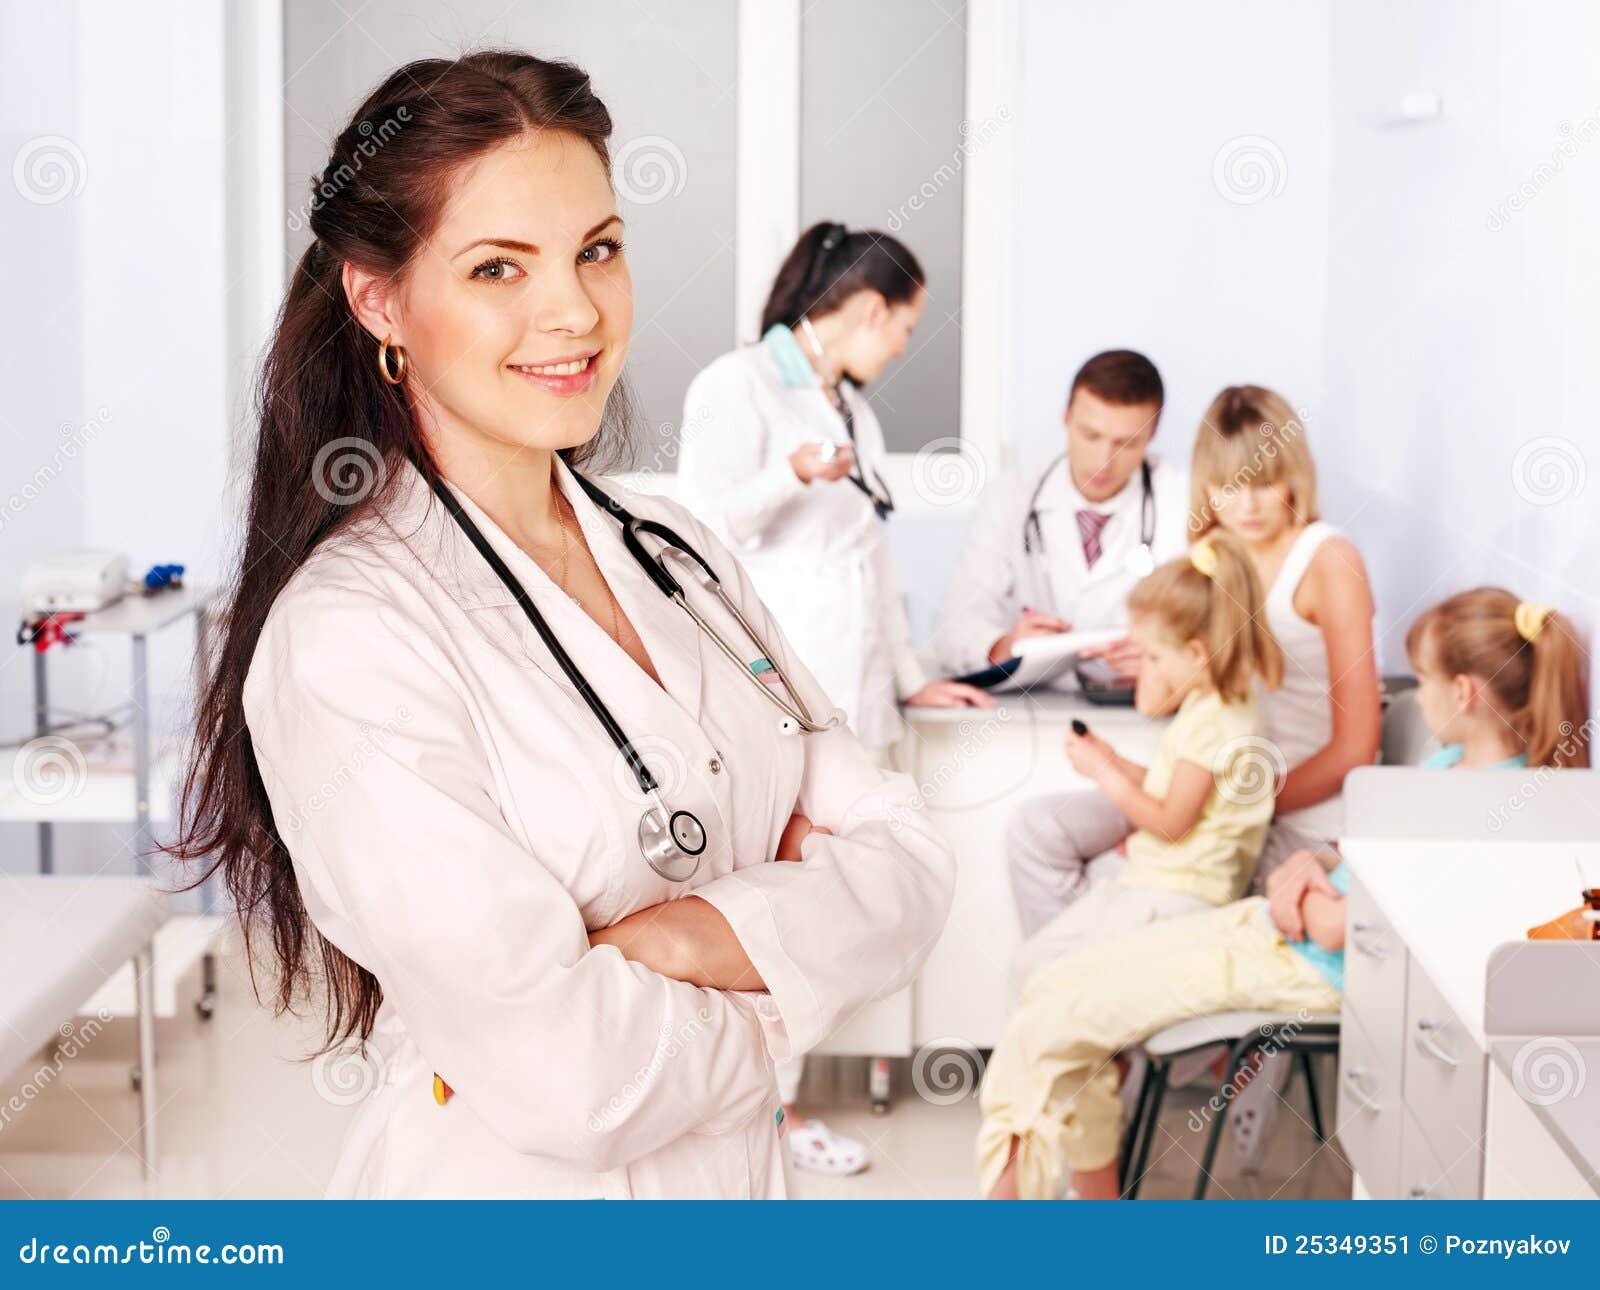 Barndoktorssjukhus